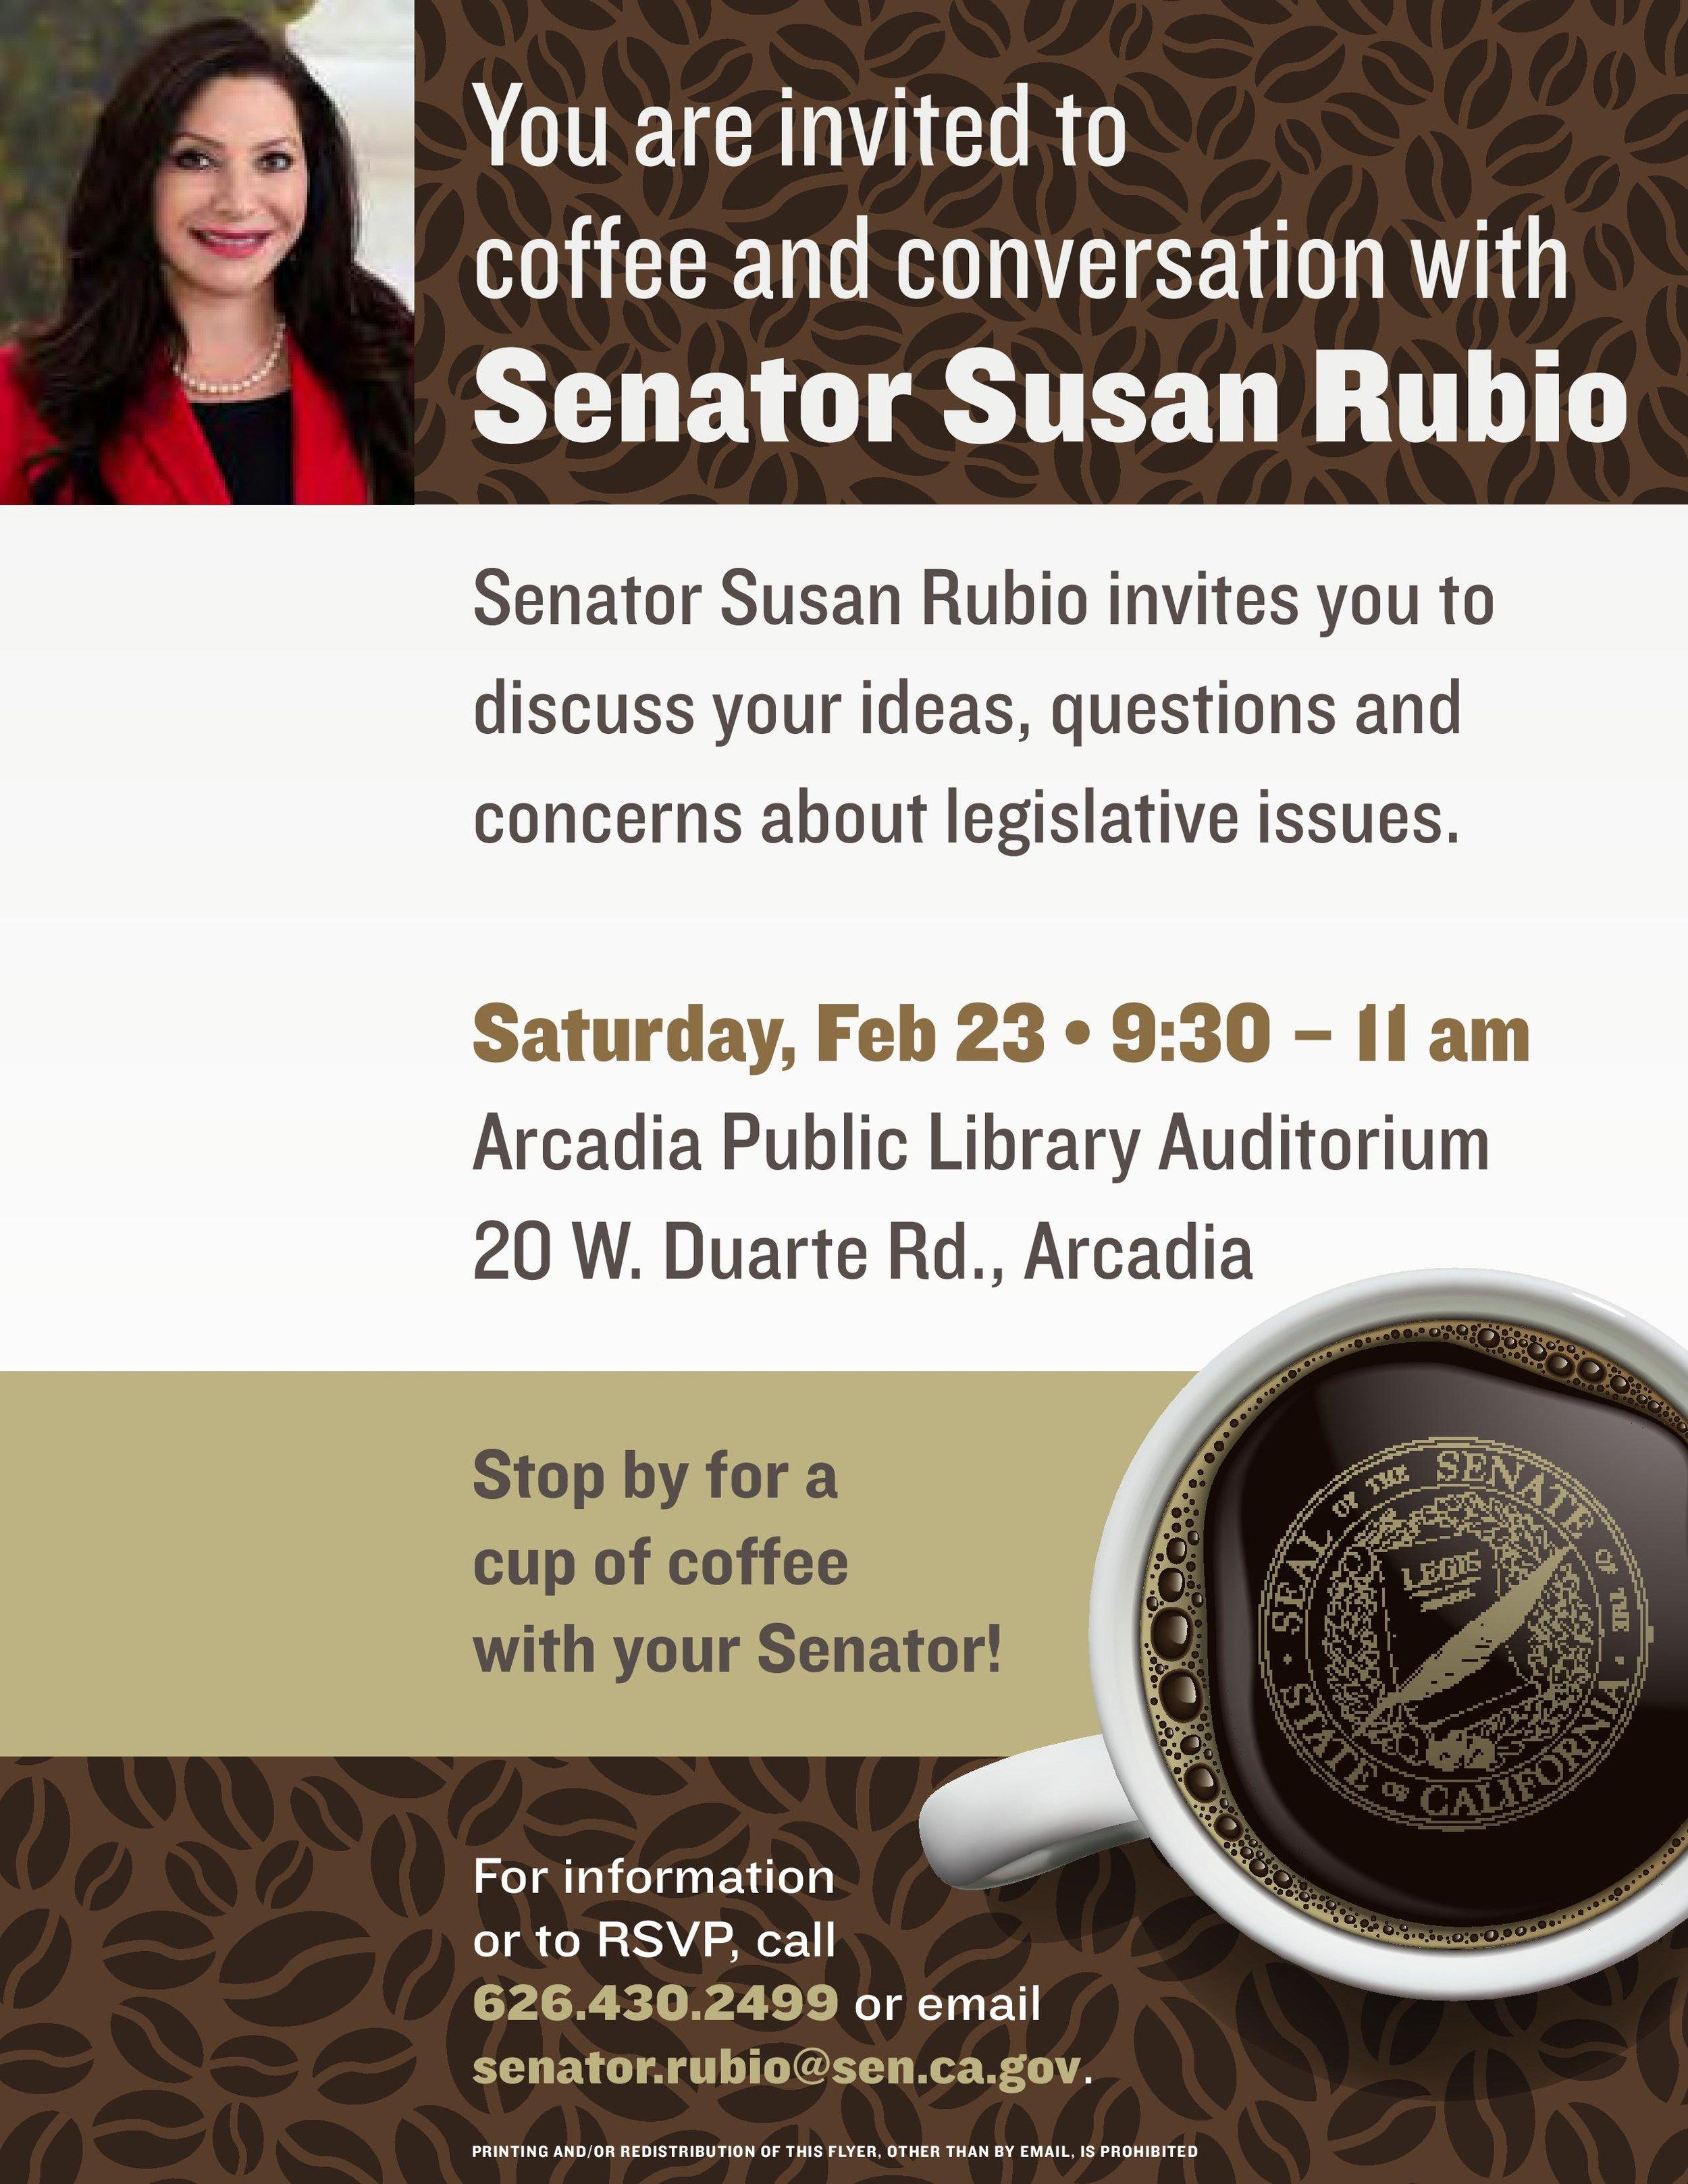 coffee & conversation with senator susan rubio - February 23rd, 2019